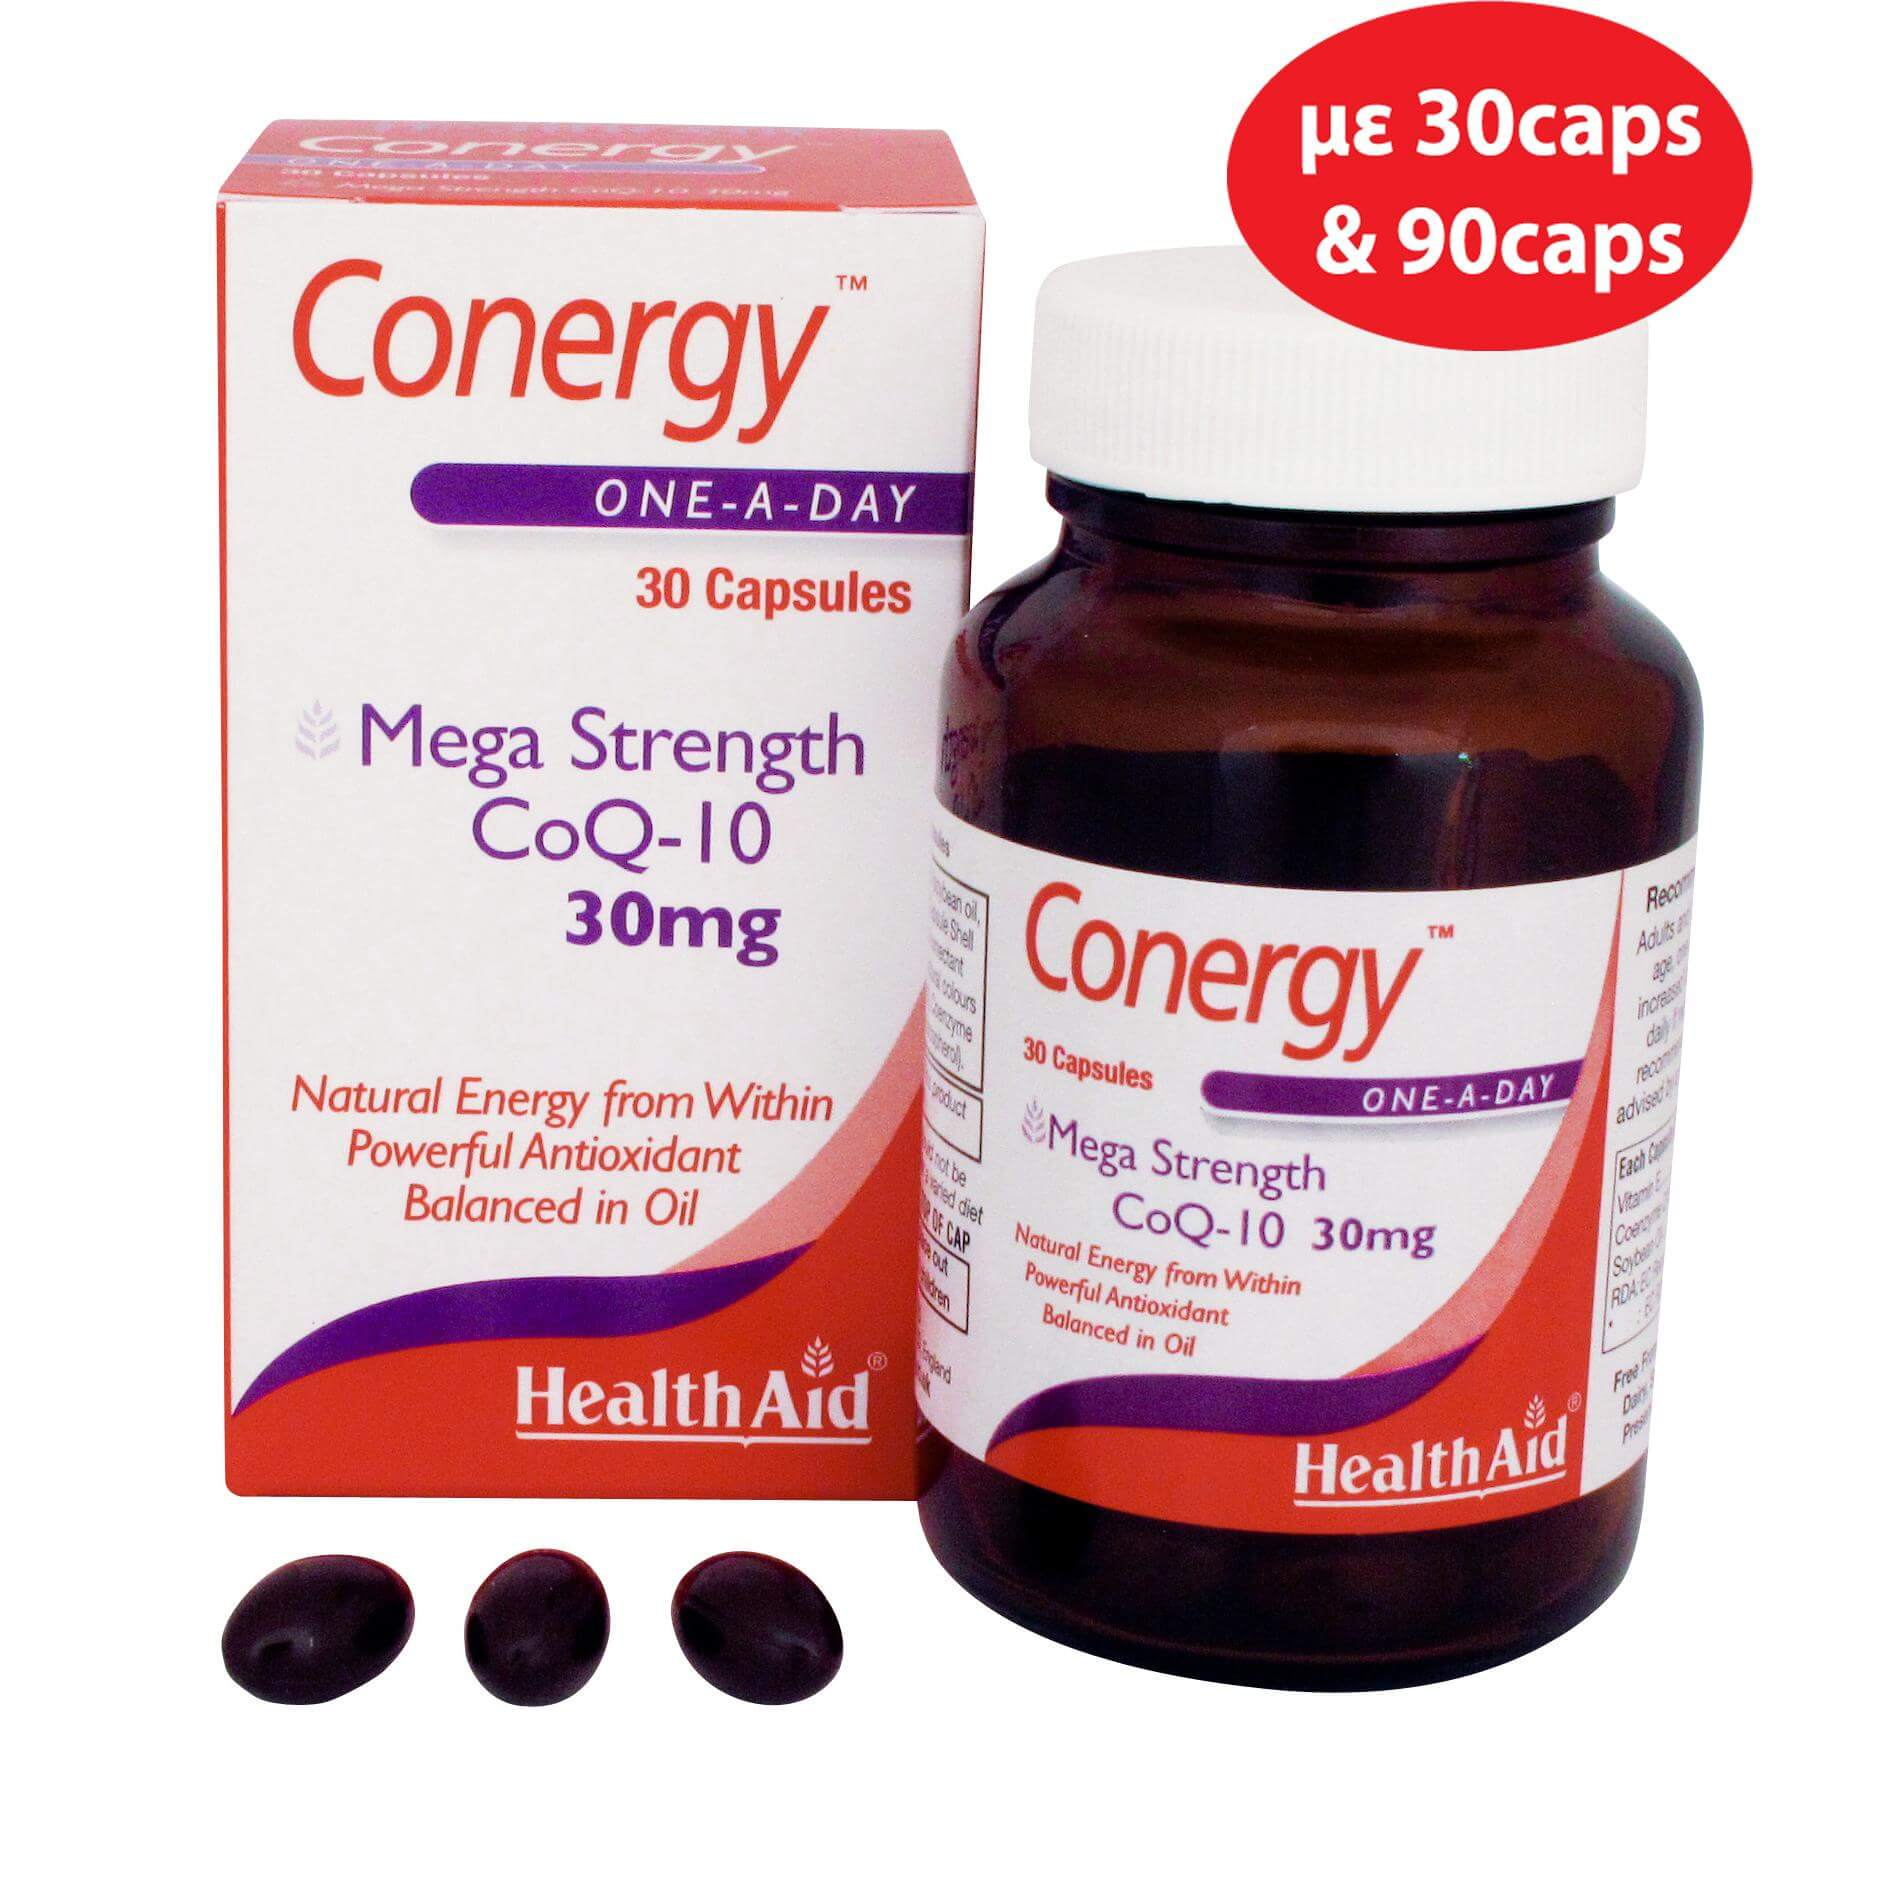 Health Aid Conergy Coq10 30Mg Συνένζυμο Q10 Απελευθερώνει Ενέργεια – Antioxidant 90caps